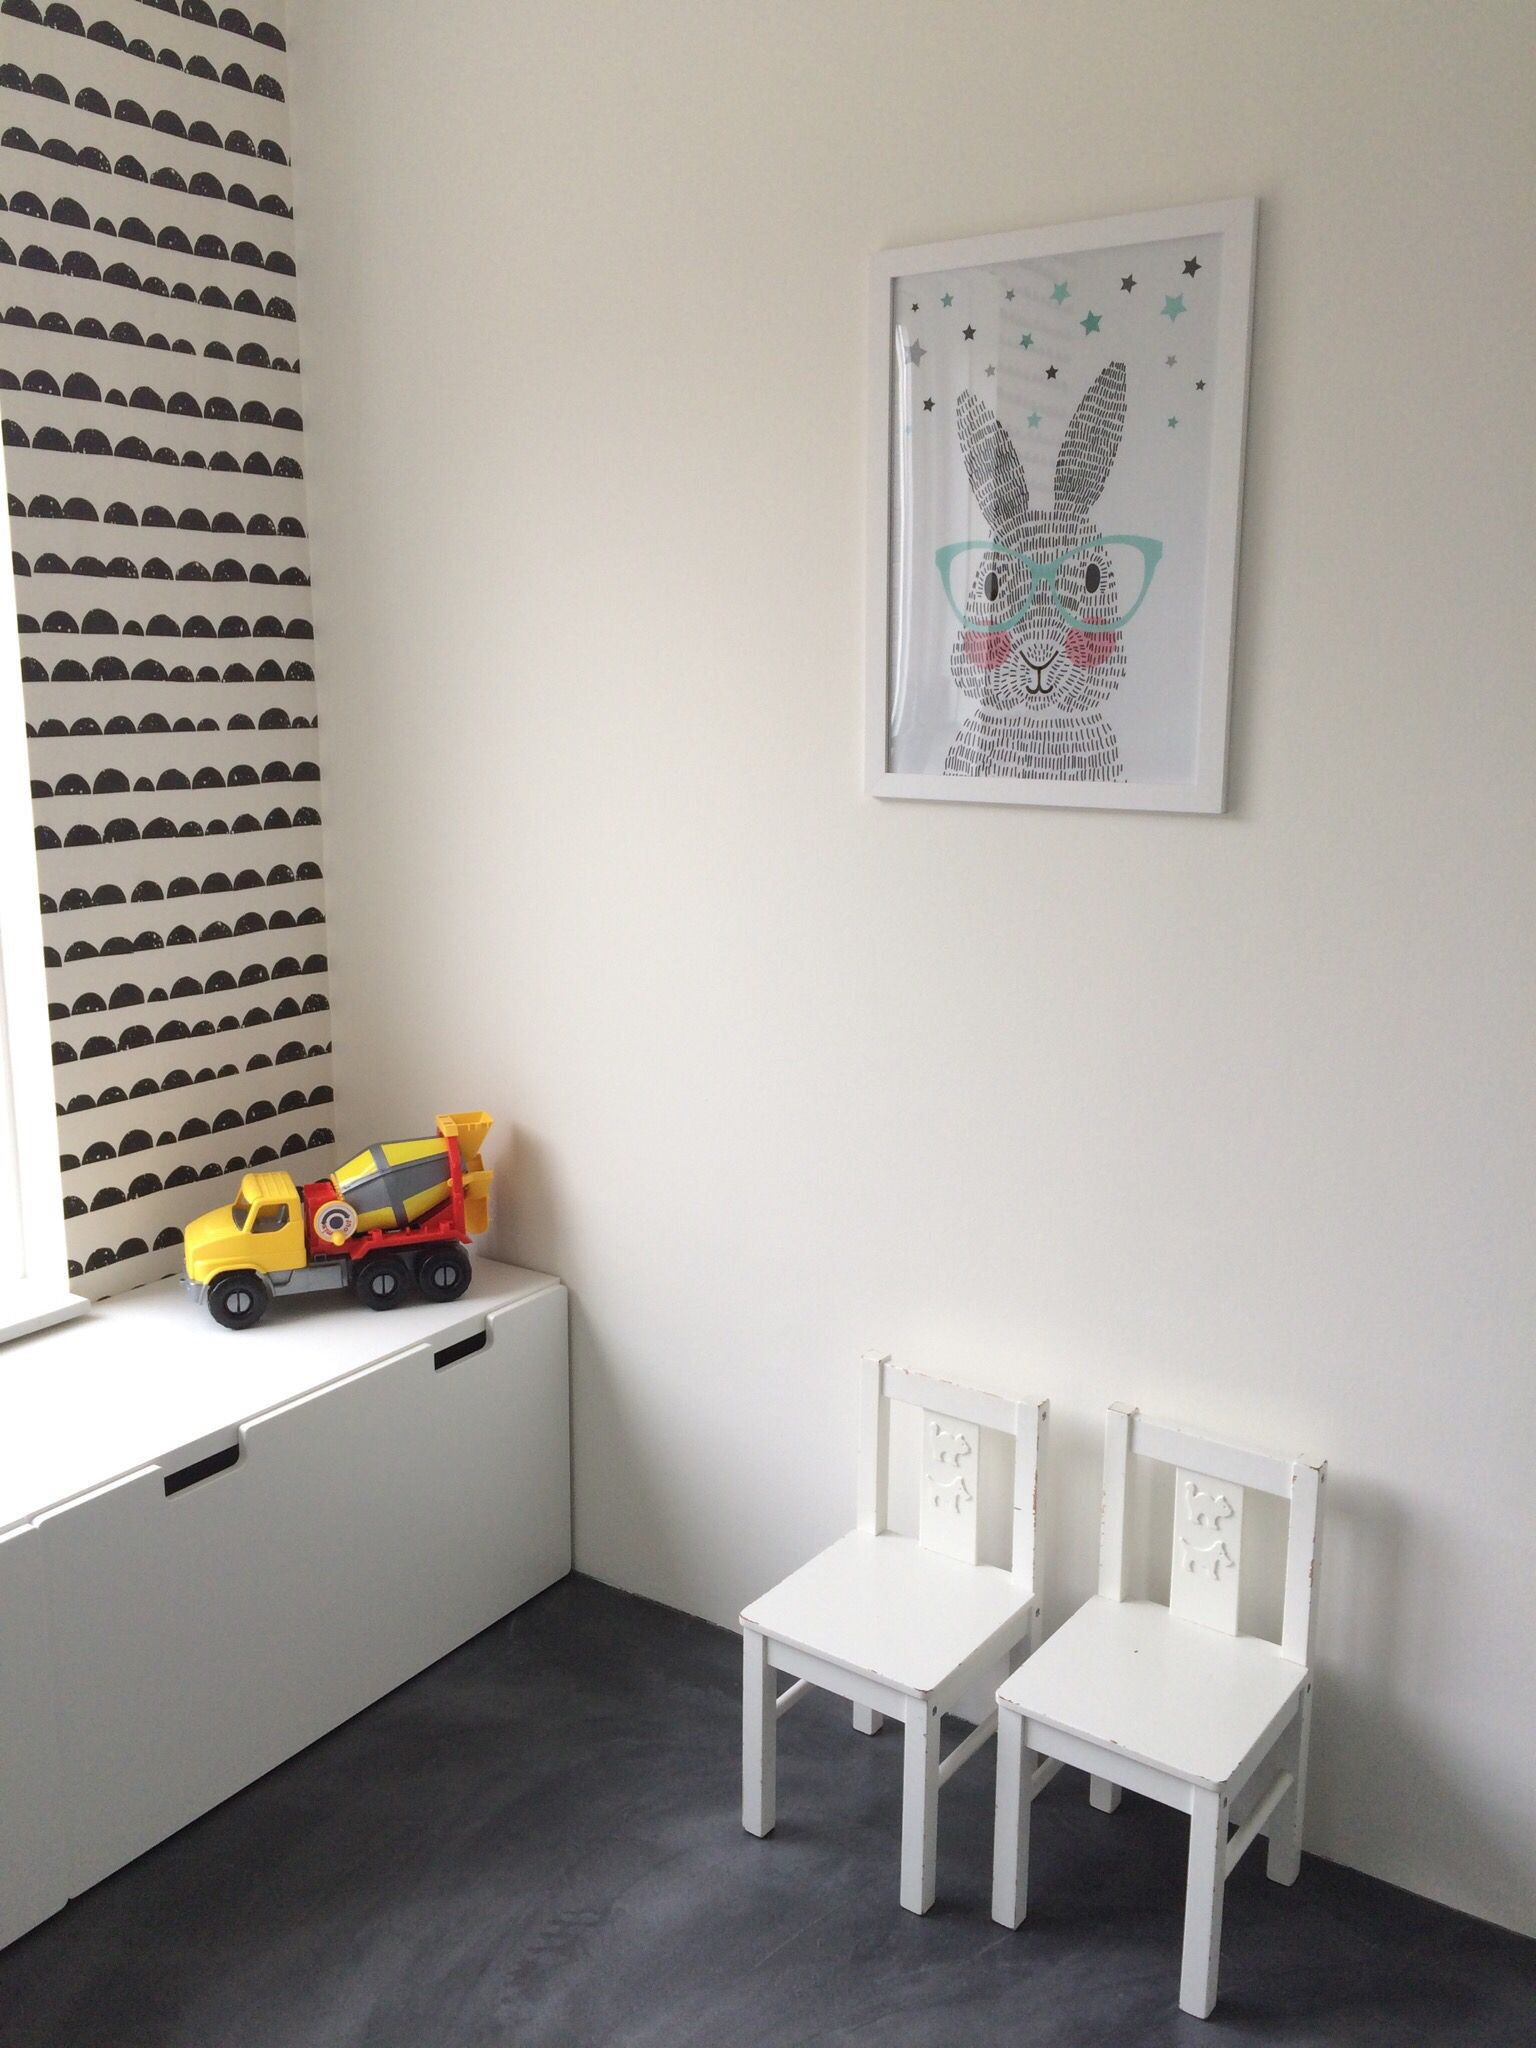 kinderkamer speelkamer speelruimte mr rabbit poster speelgoedkist